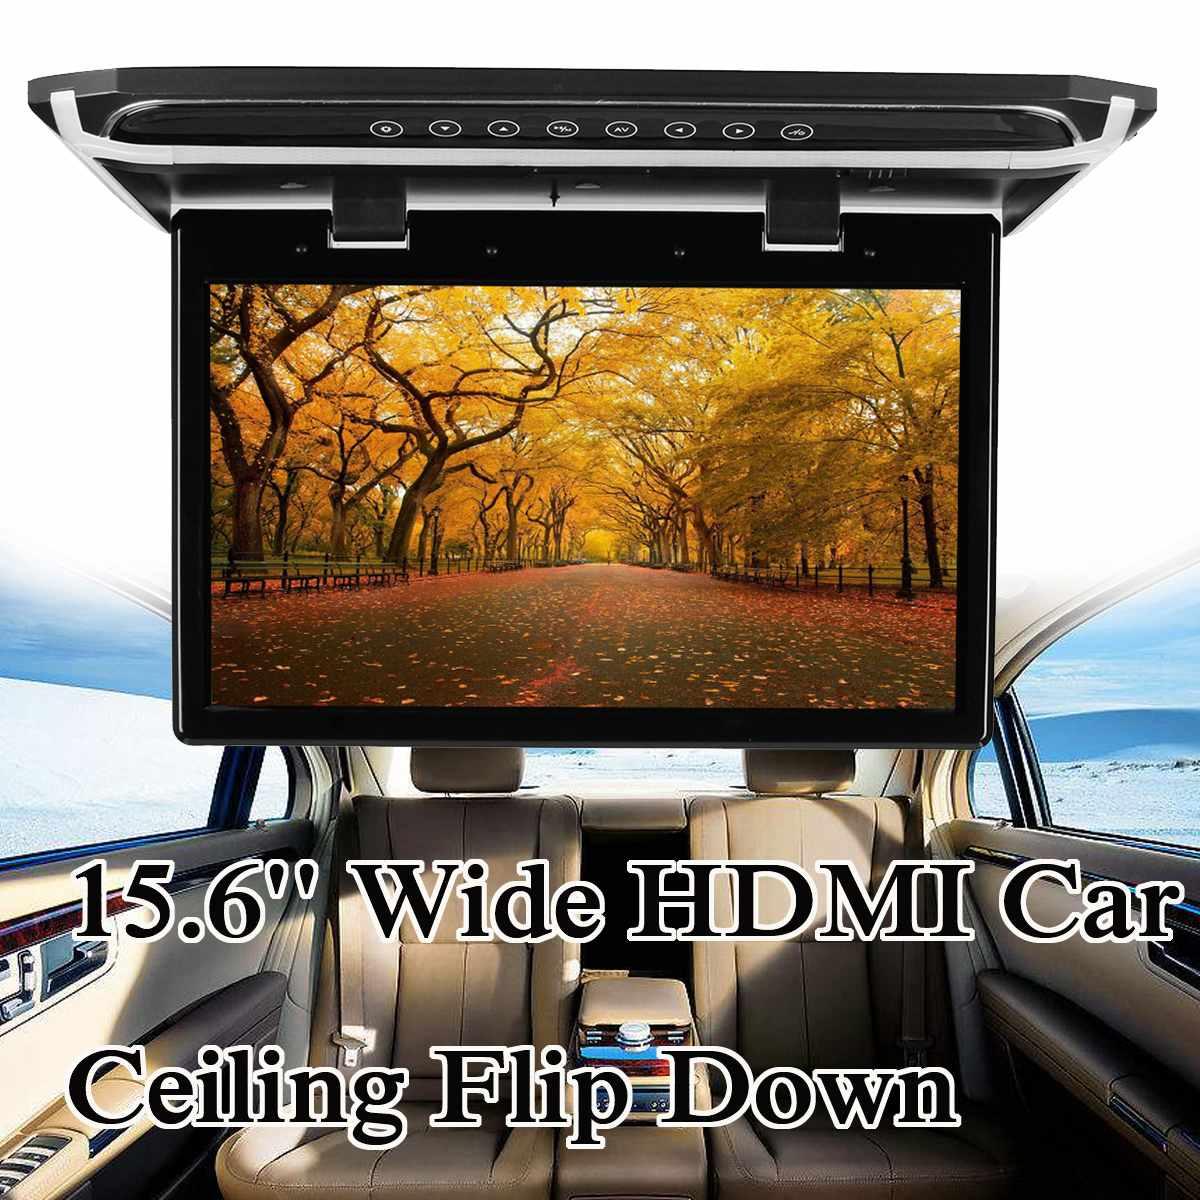 15.6 hd tela larga carro dvd player hdmi teto do carro flip down monitor telhado montagem jogador 1920*1080 - 5